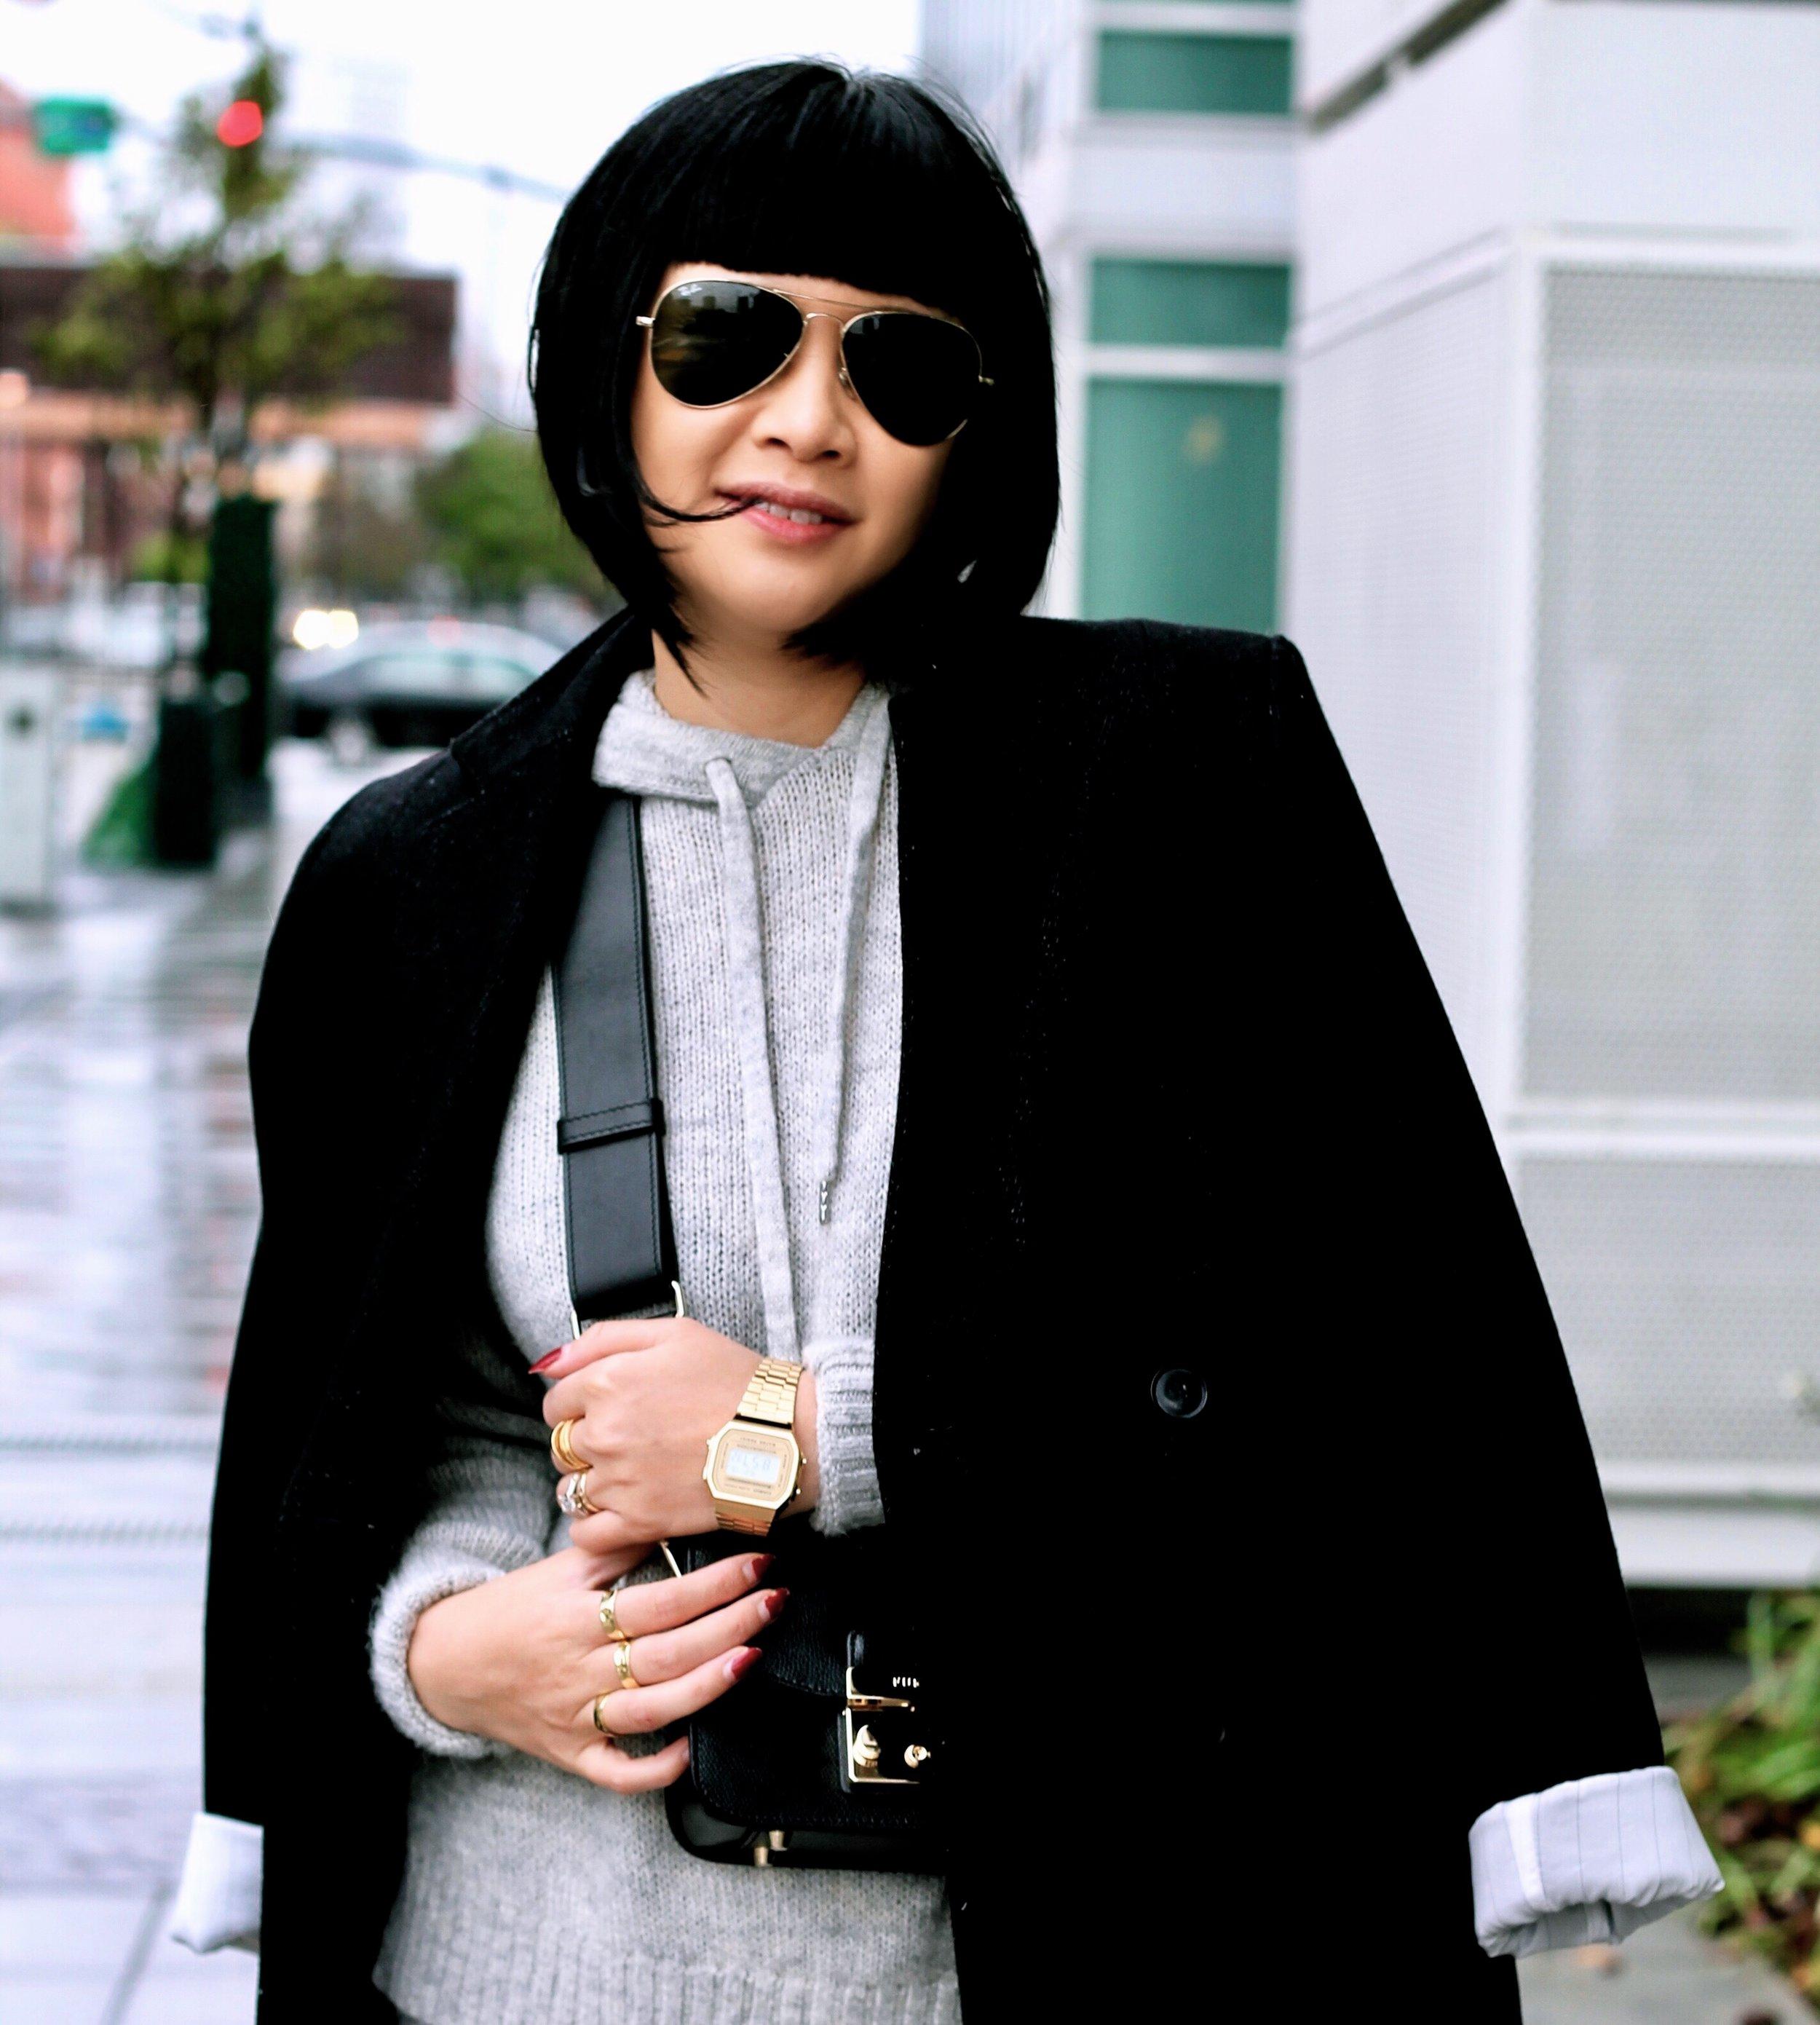 Casio watch at Bloomingdale's SF, Furla bag, Whyred coat, Ray-Ban sunglasses, H&M sweater